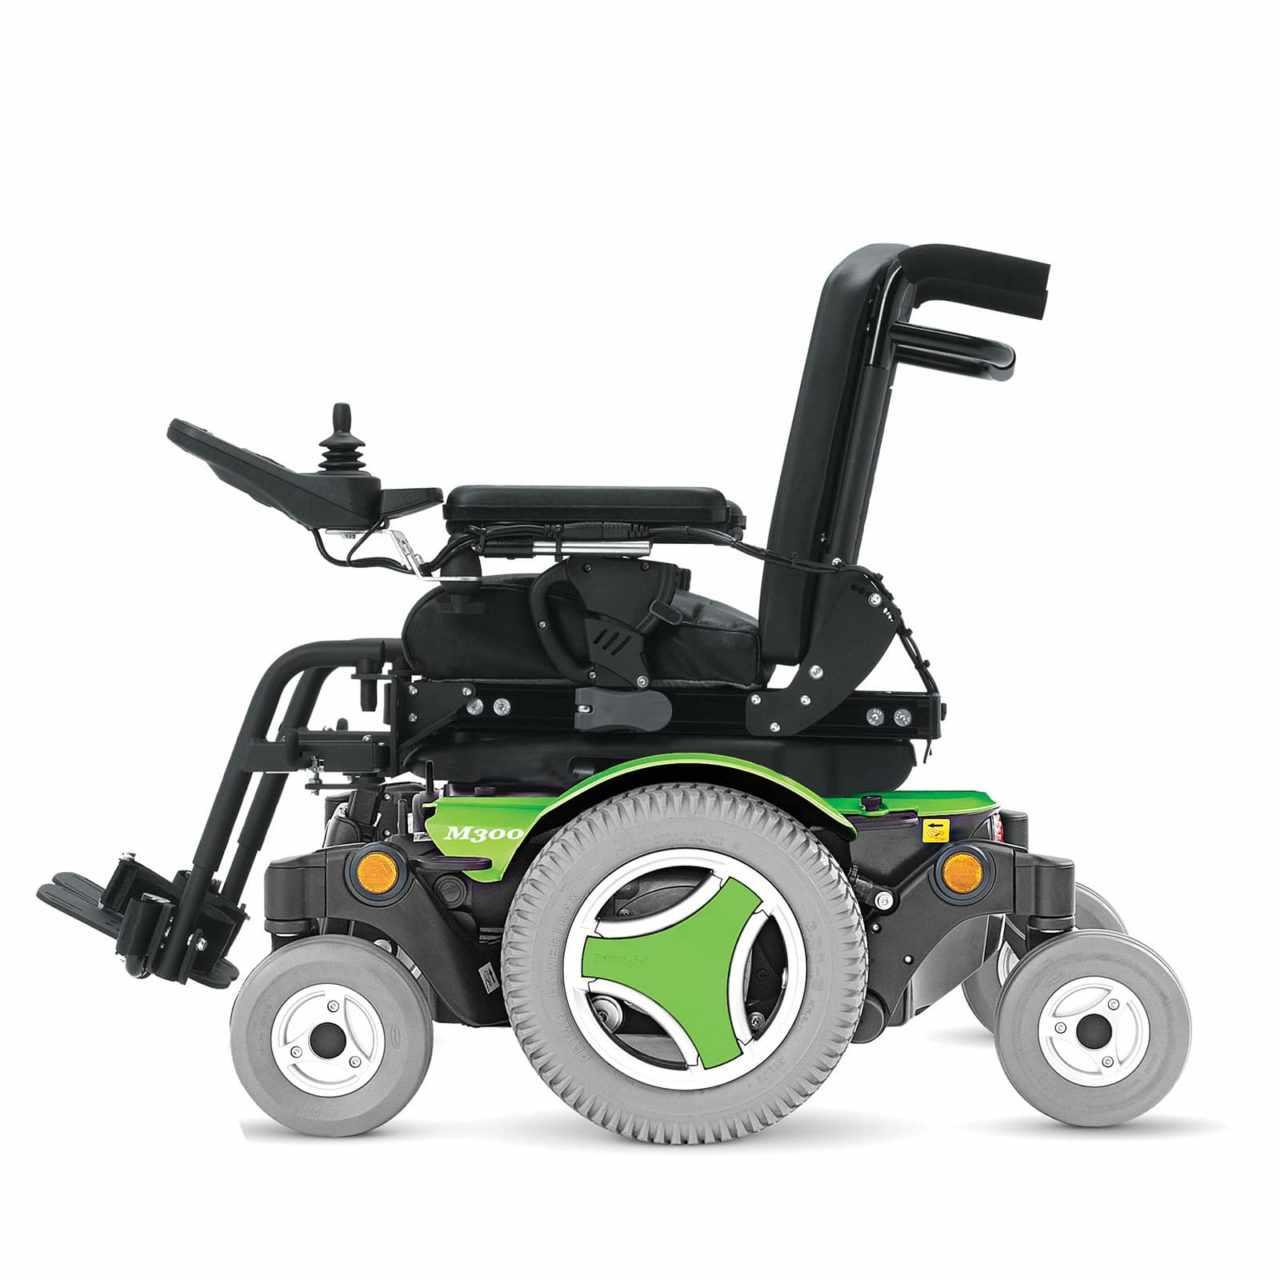 Permobil M300 Ps Junior Power Wheelchair